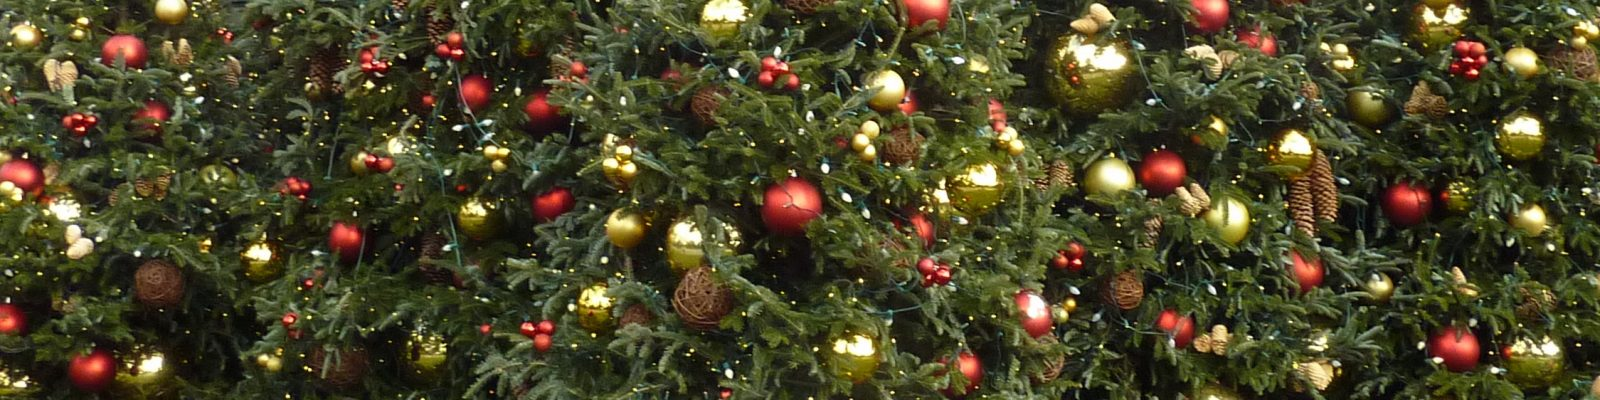 cropped-2012-11-28_NYBOTAN-HRBRM_071-0_JAS_P1090430.jpg